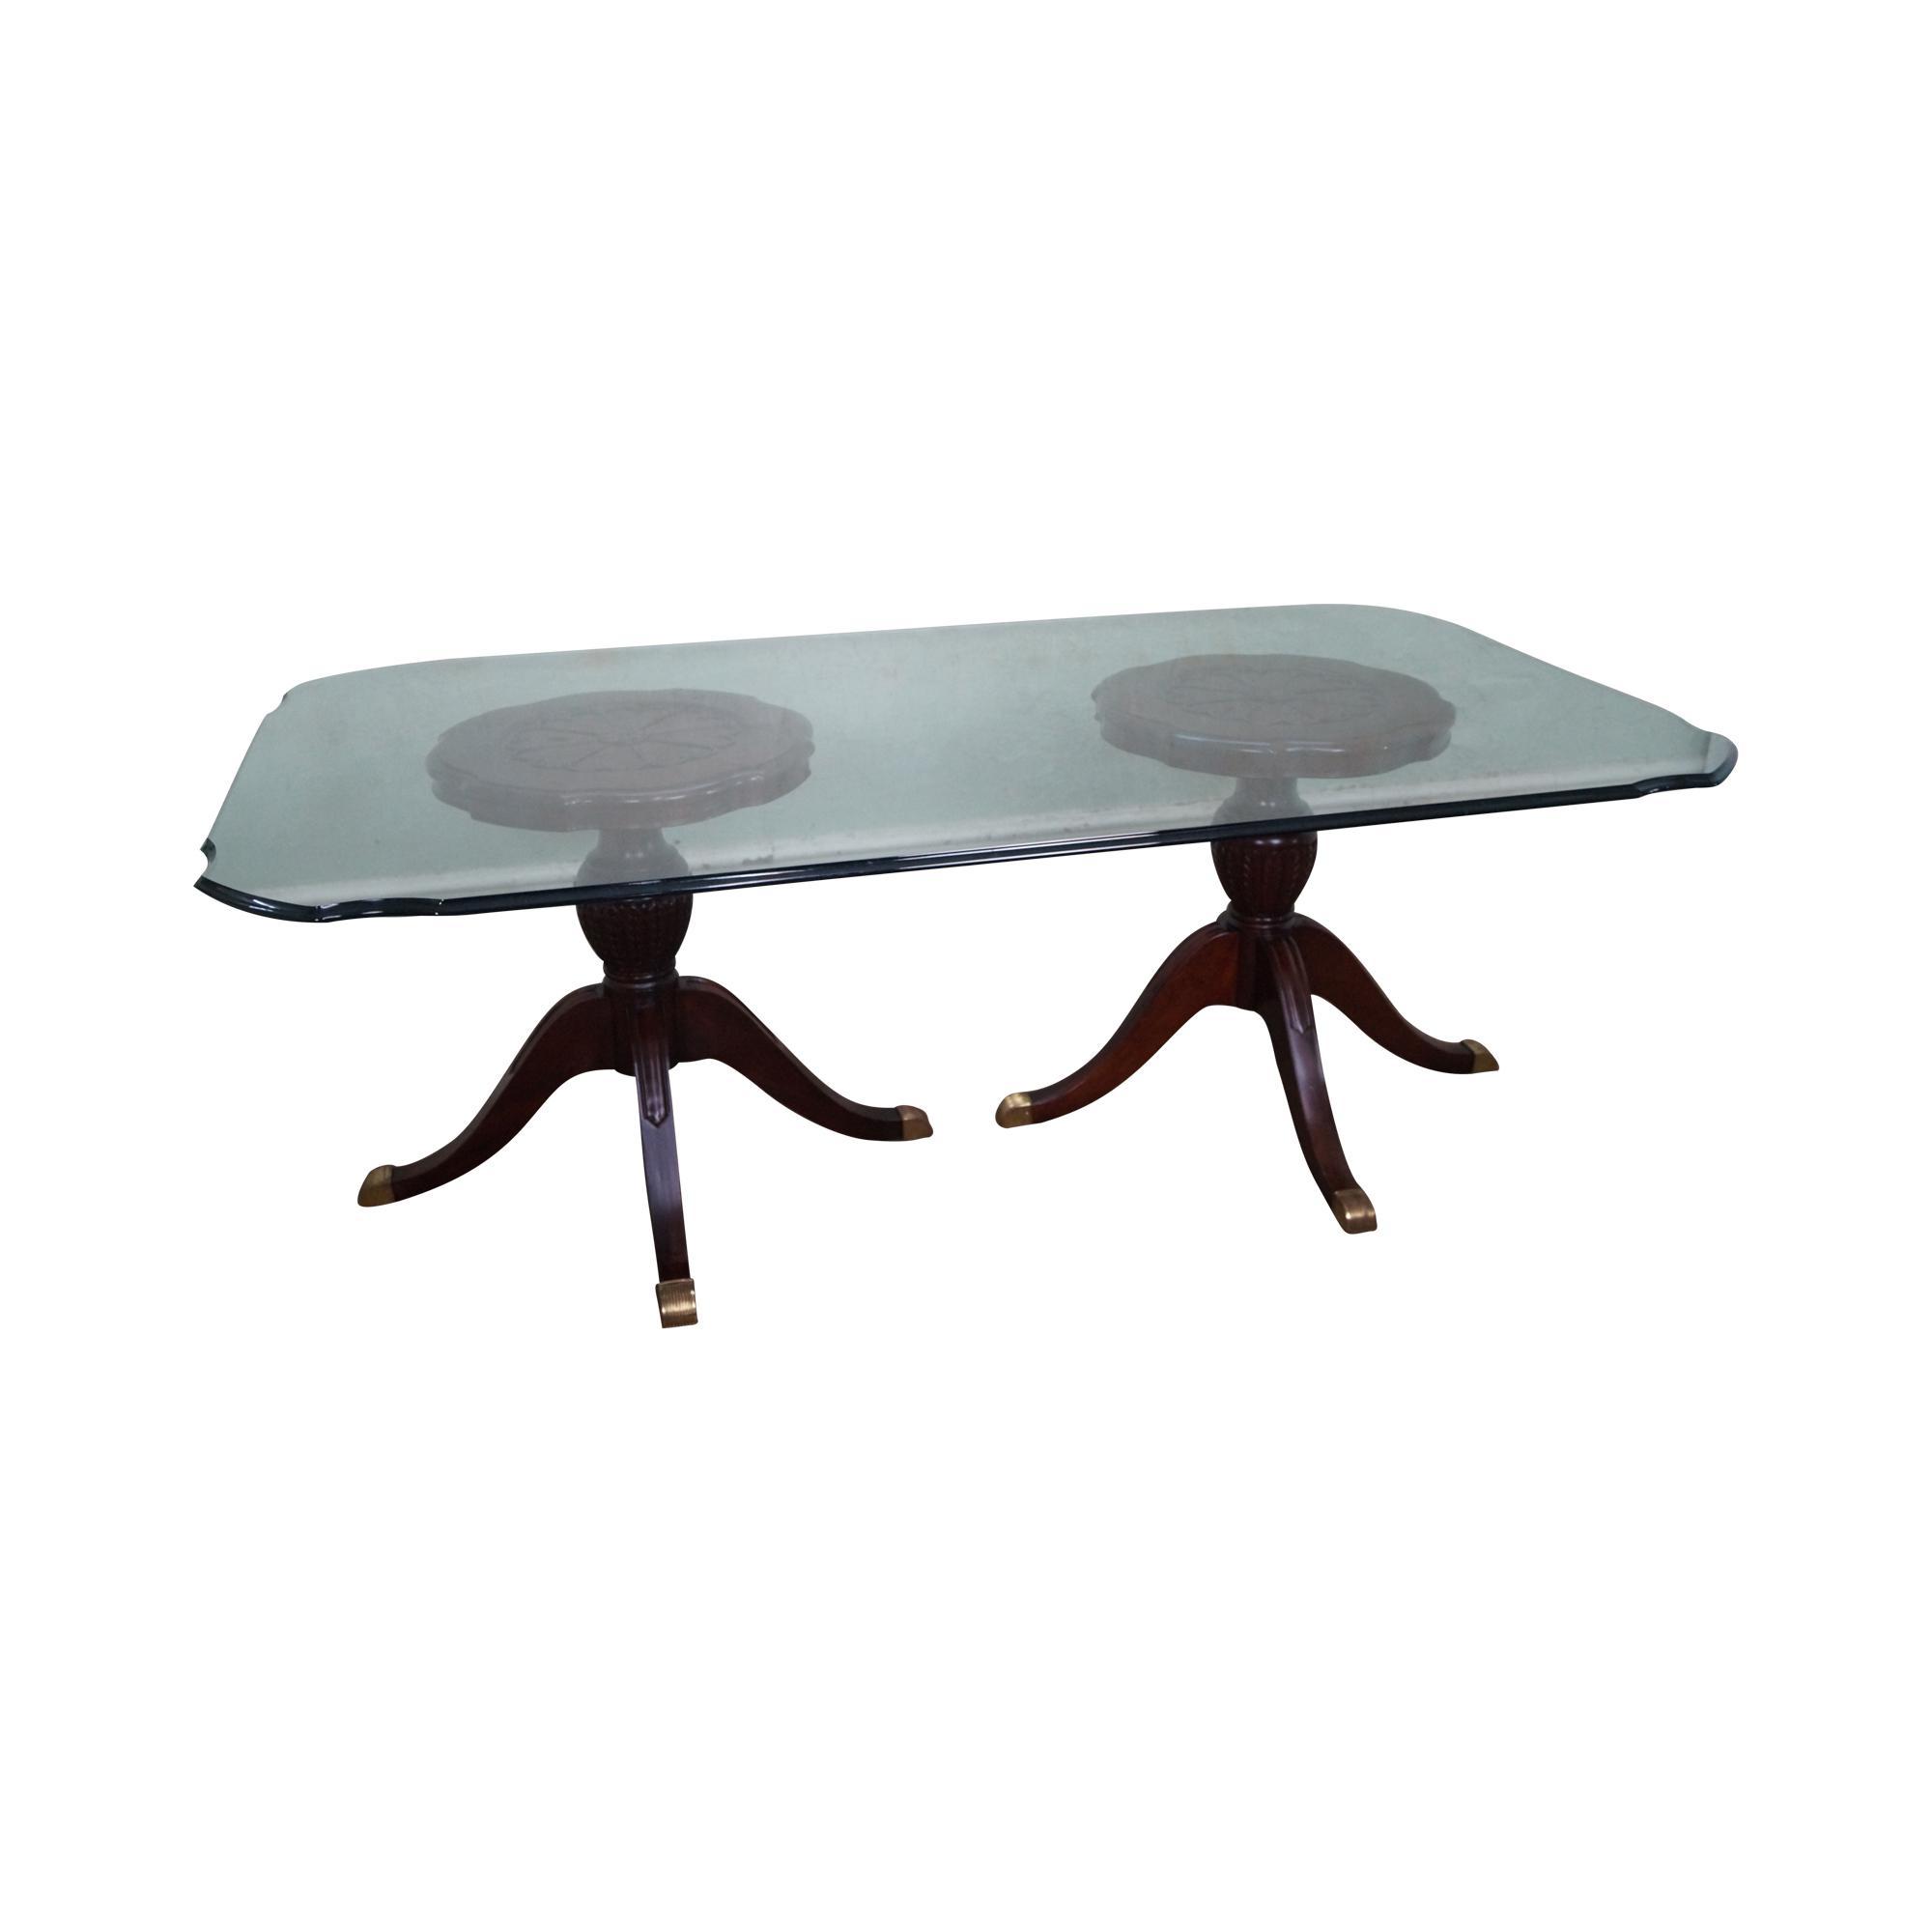 Duncan Storage Coffee Table: Maitland Smith Glass & Mahogany Duncan Phyfe Dining Table